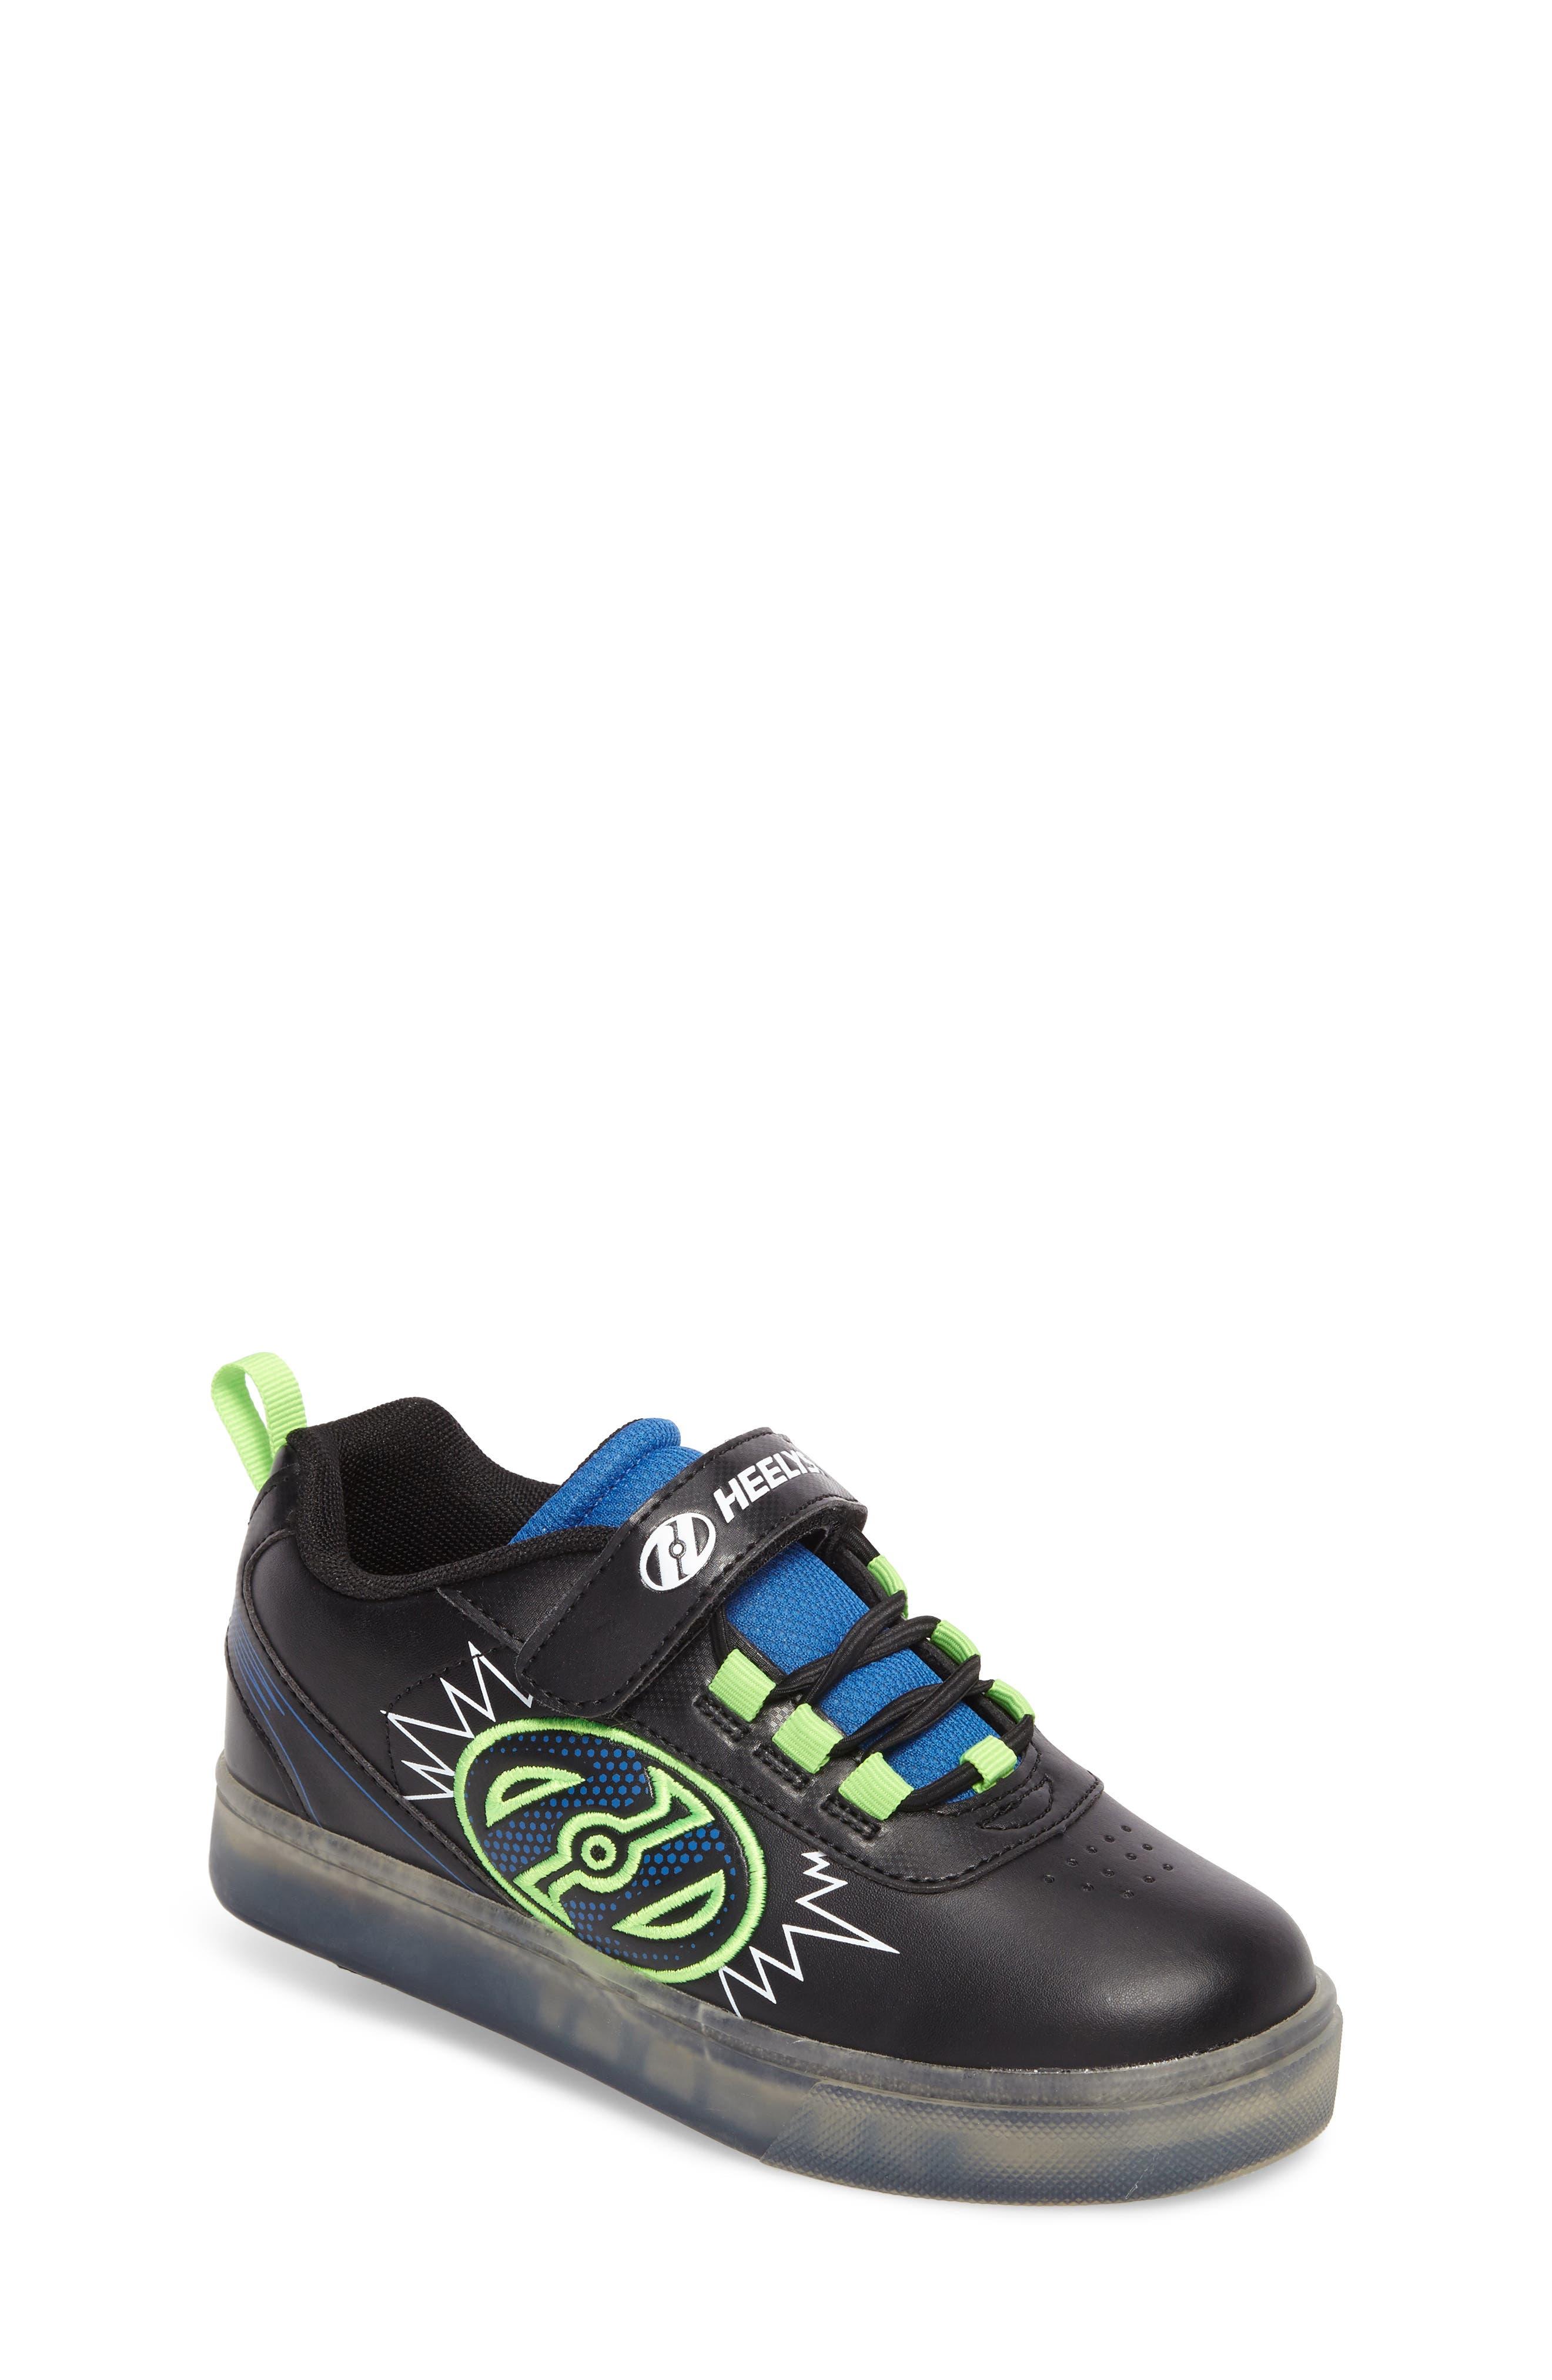 Pow X2 Light-Up Wheeled Skate Sneaker,                             Main thumbnail 1, color,                             011